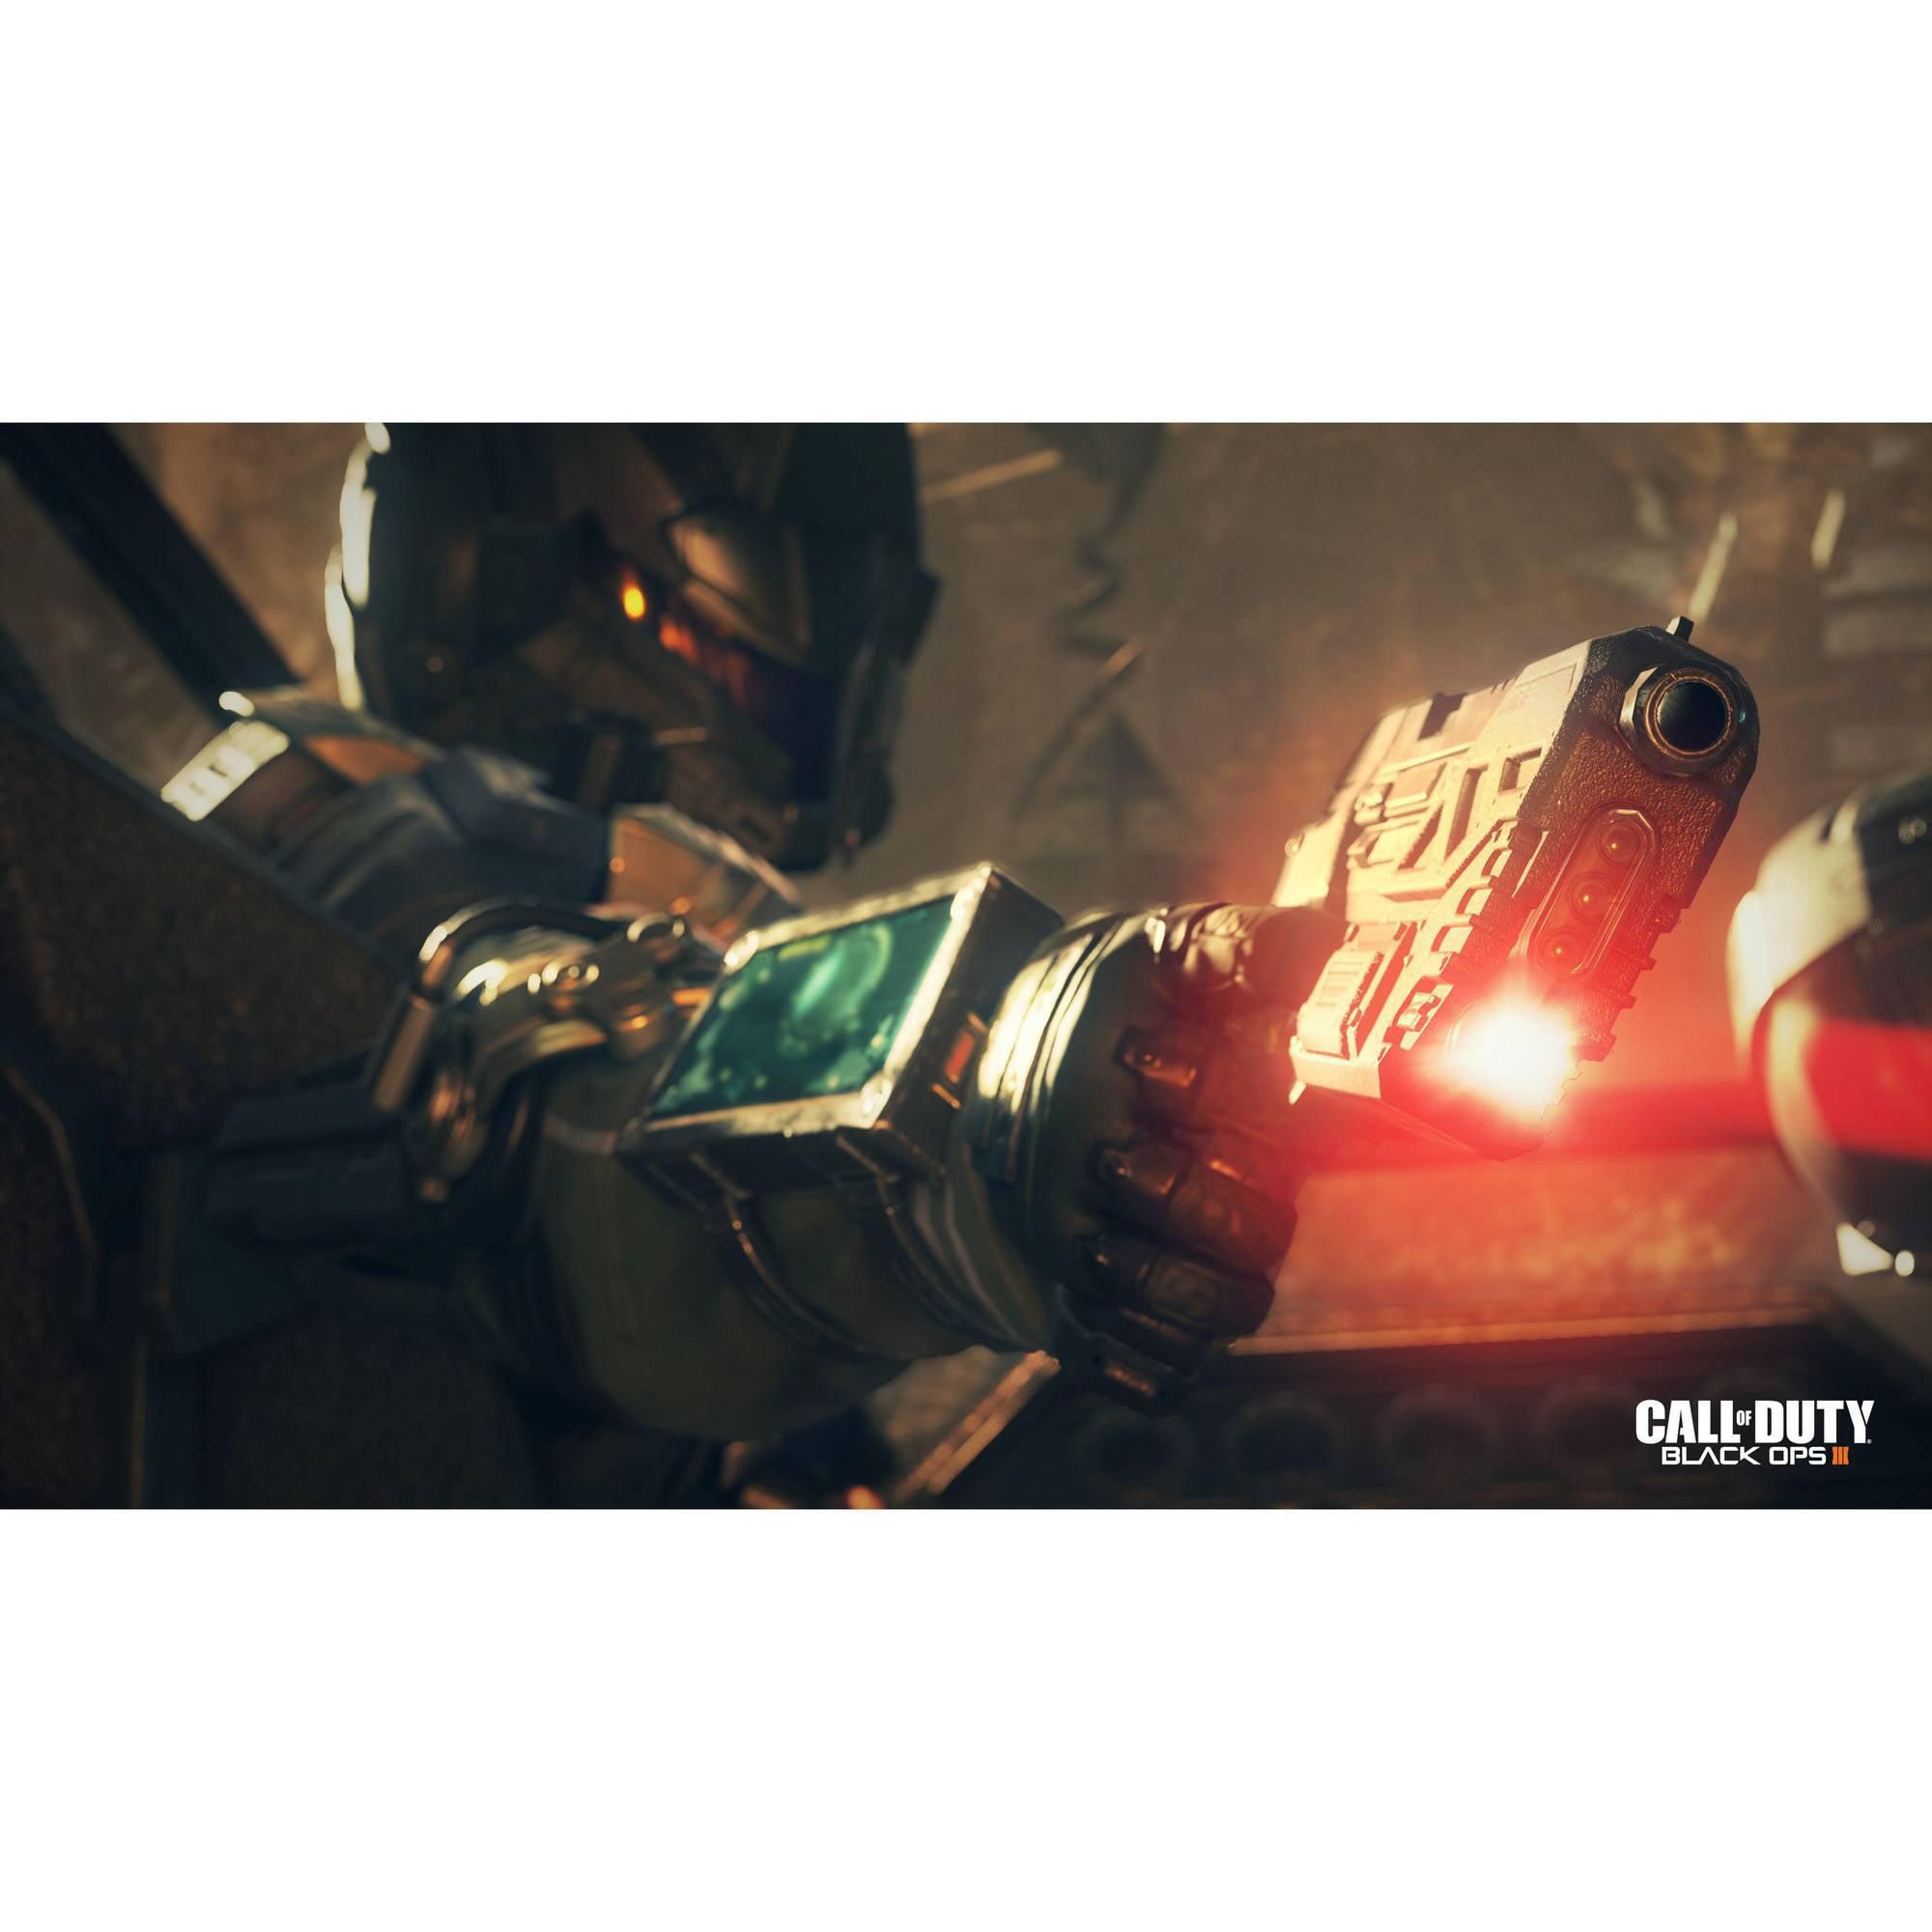 call of duty black ops iii (ps4) - walmart